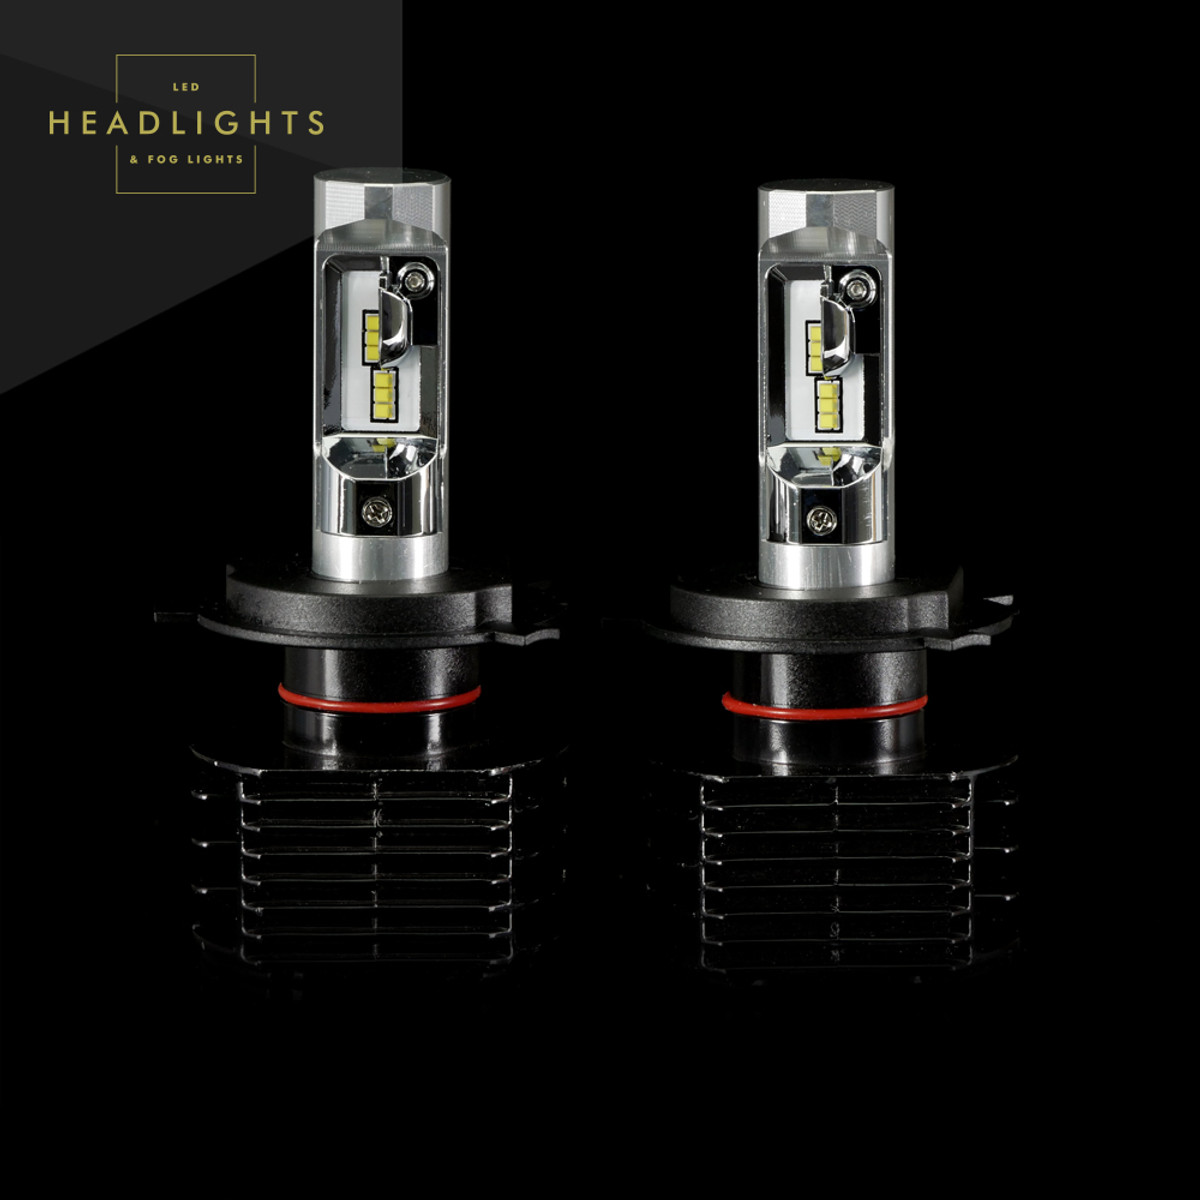 GTR Lighting Ultra Series LED Headlight Bulbs - H4 / 9003 - 3rd Generation ... & GTR Lighting Ultra Series LED Headlight Bulbs - H4 / 9003 - 3rd ...